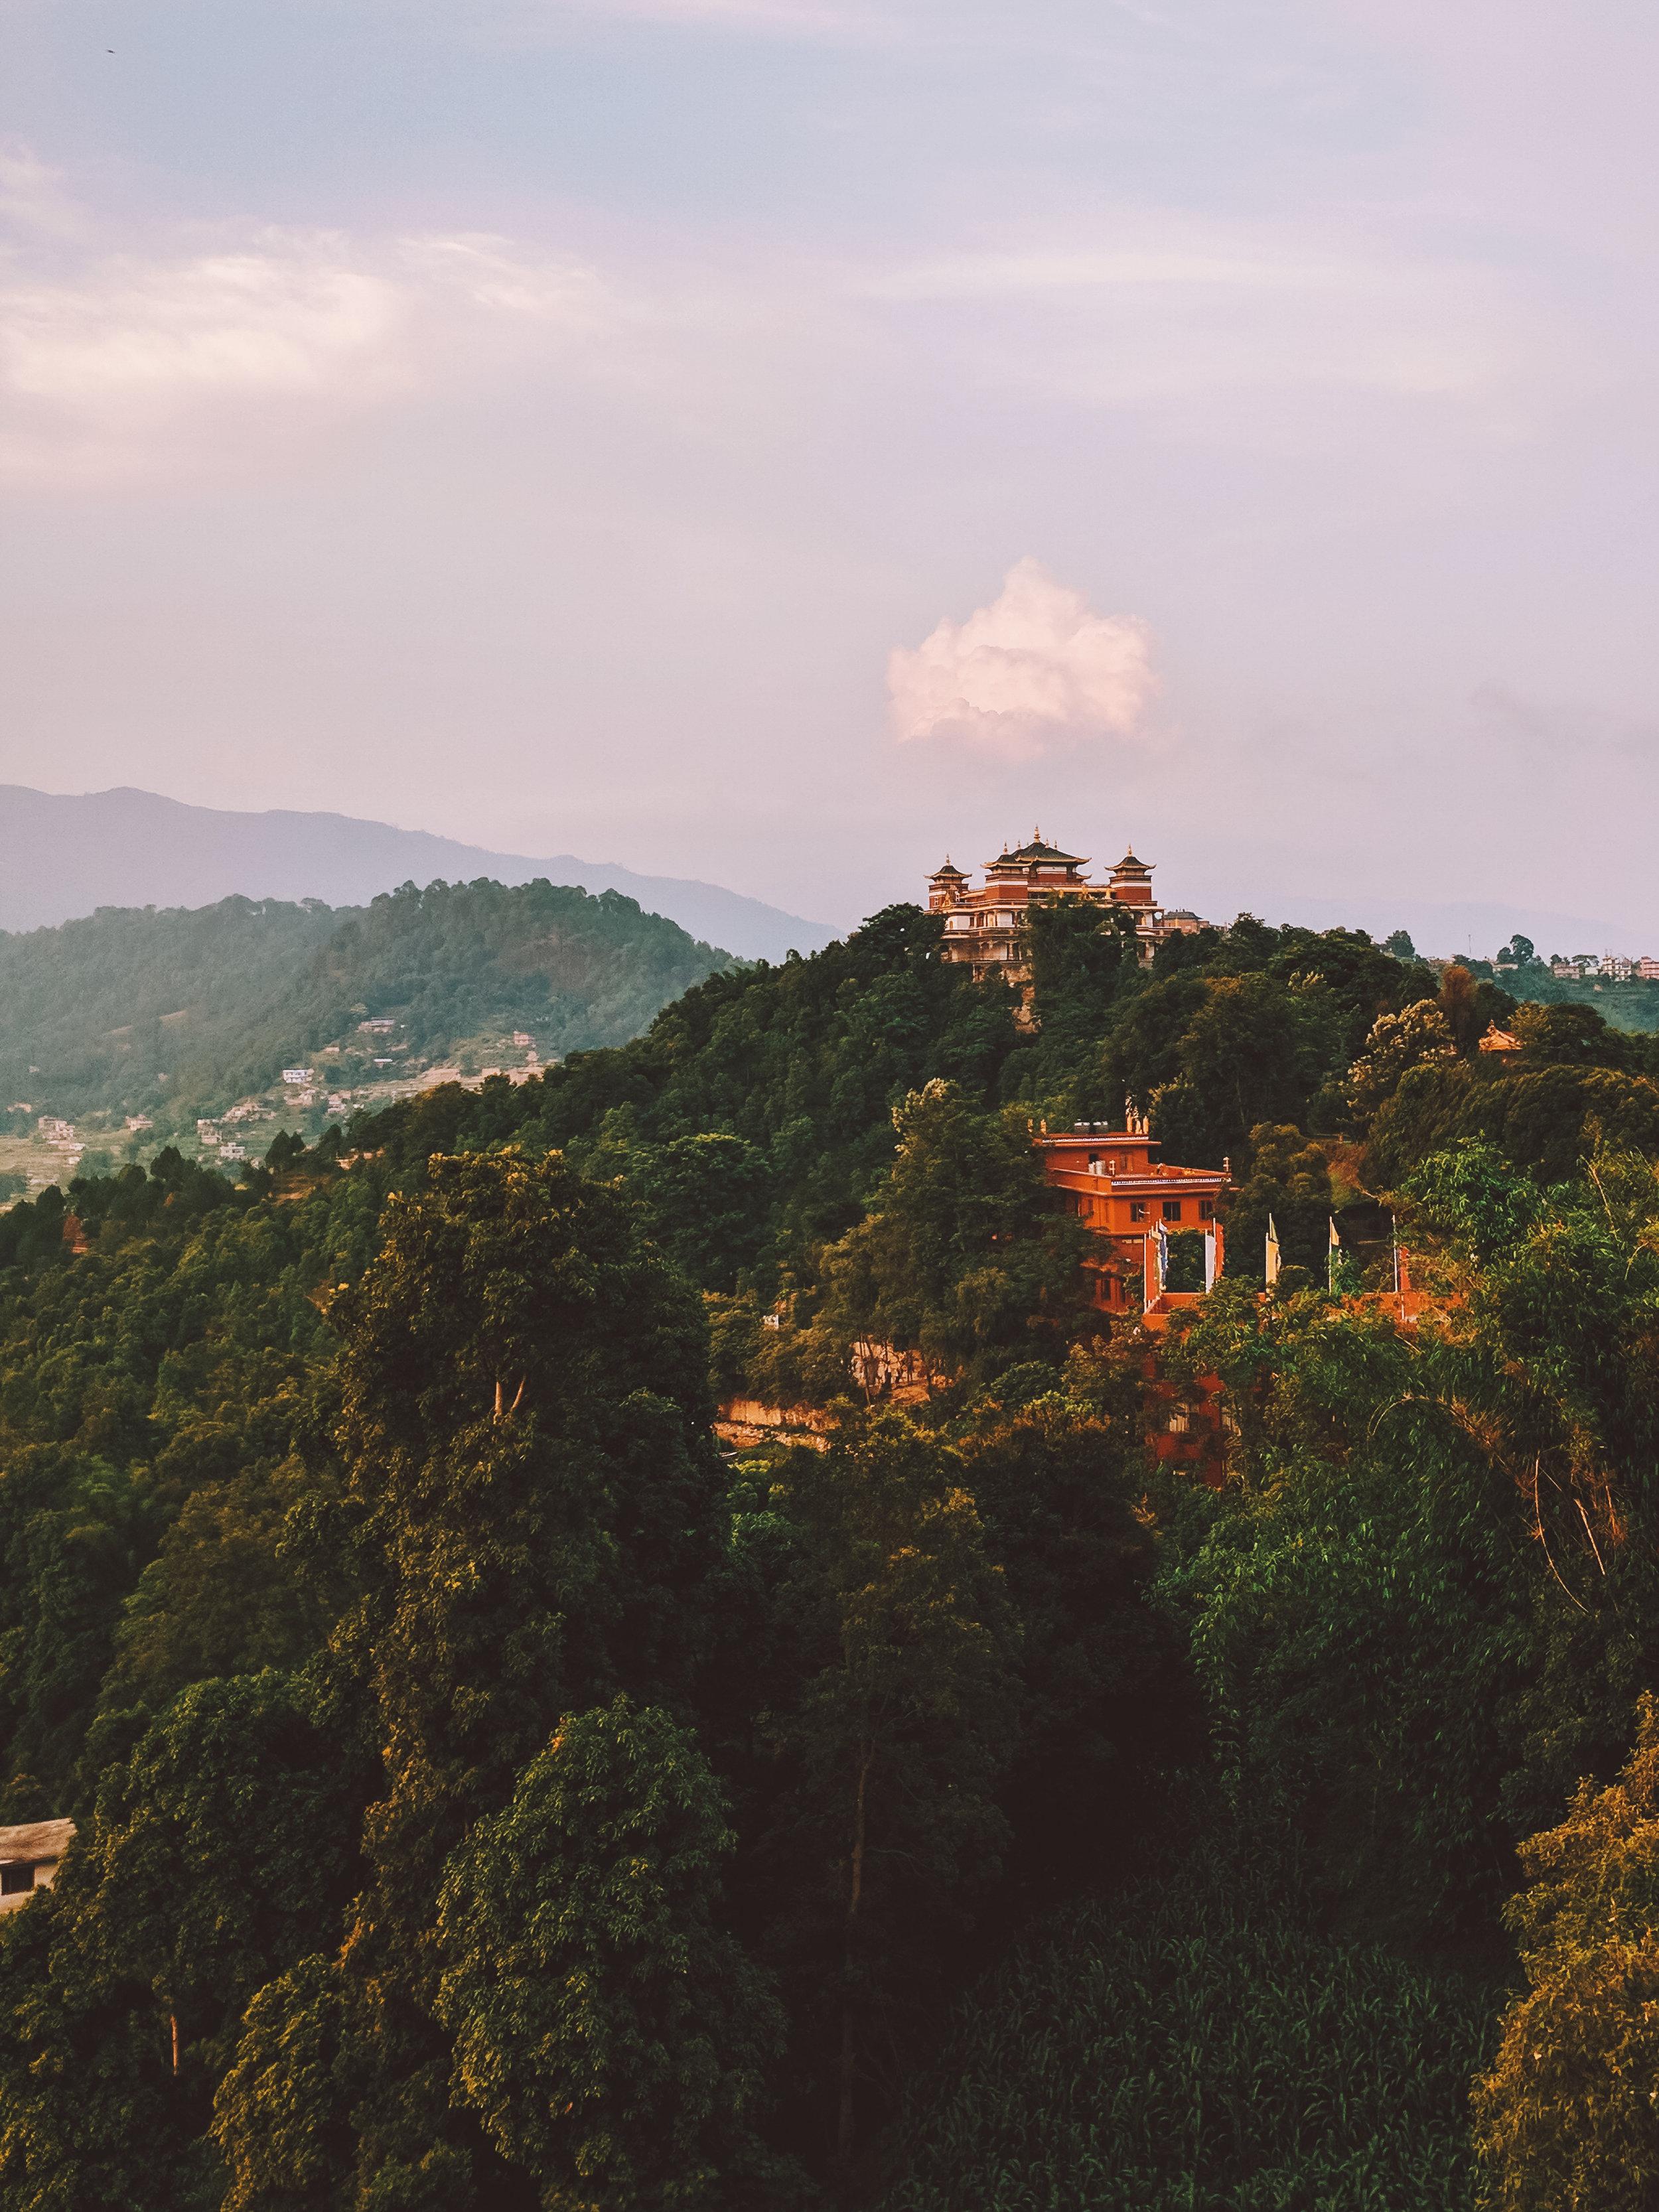 Shyalpa Monastery next to Kopan Monastery in Kathmandu, Nepal.